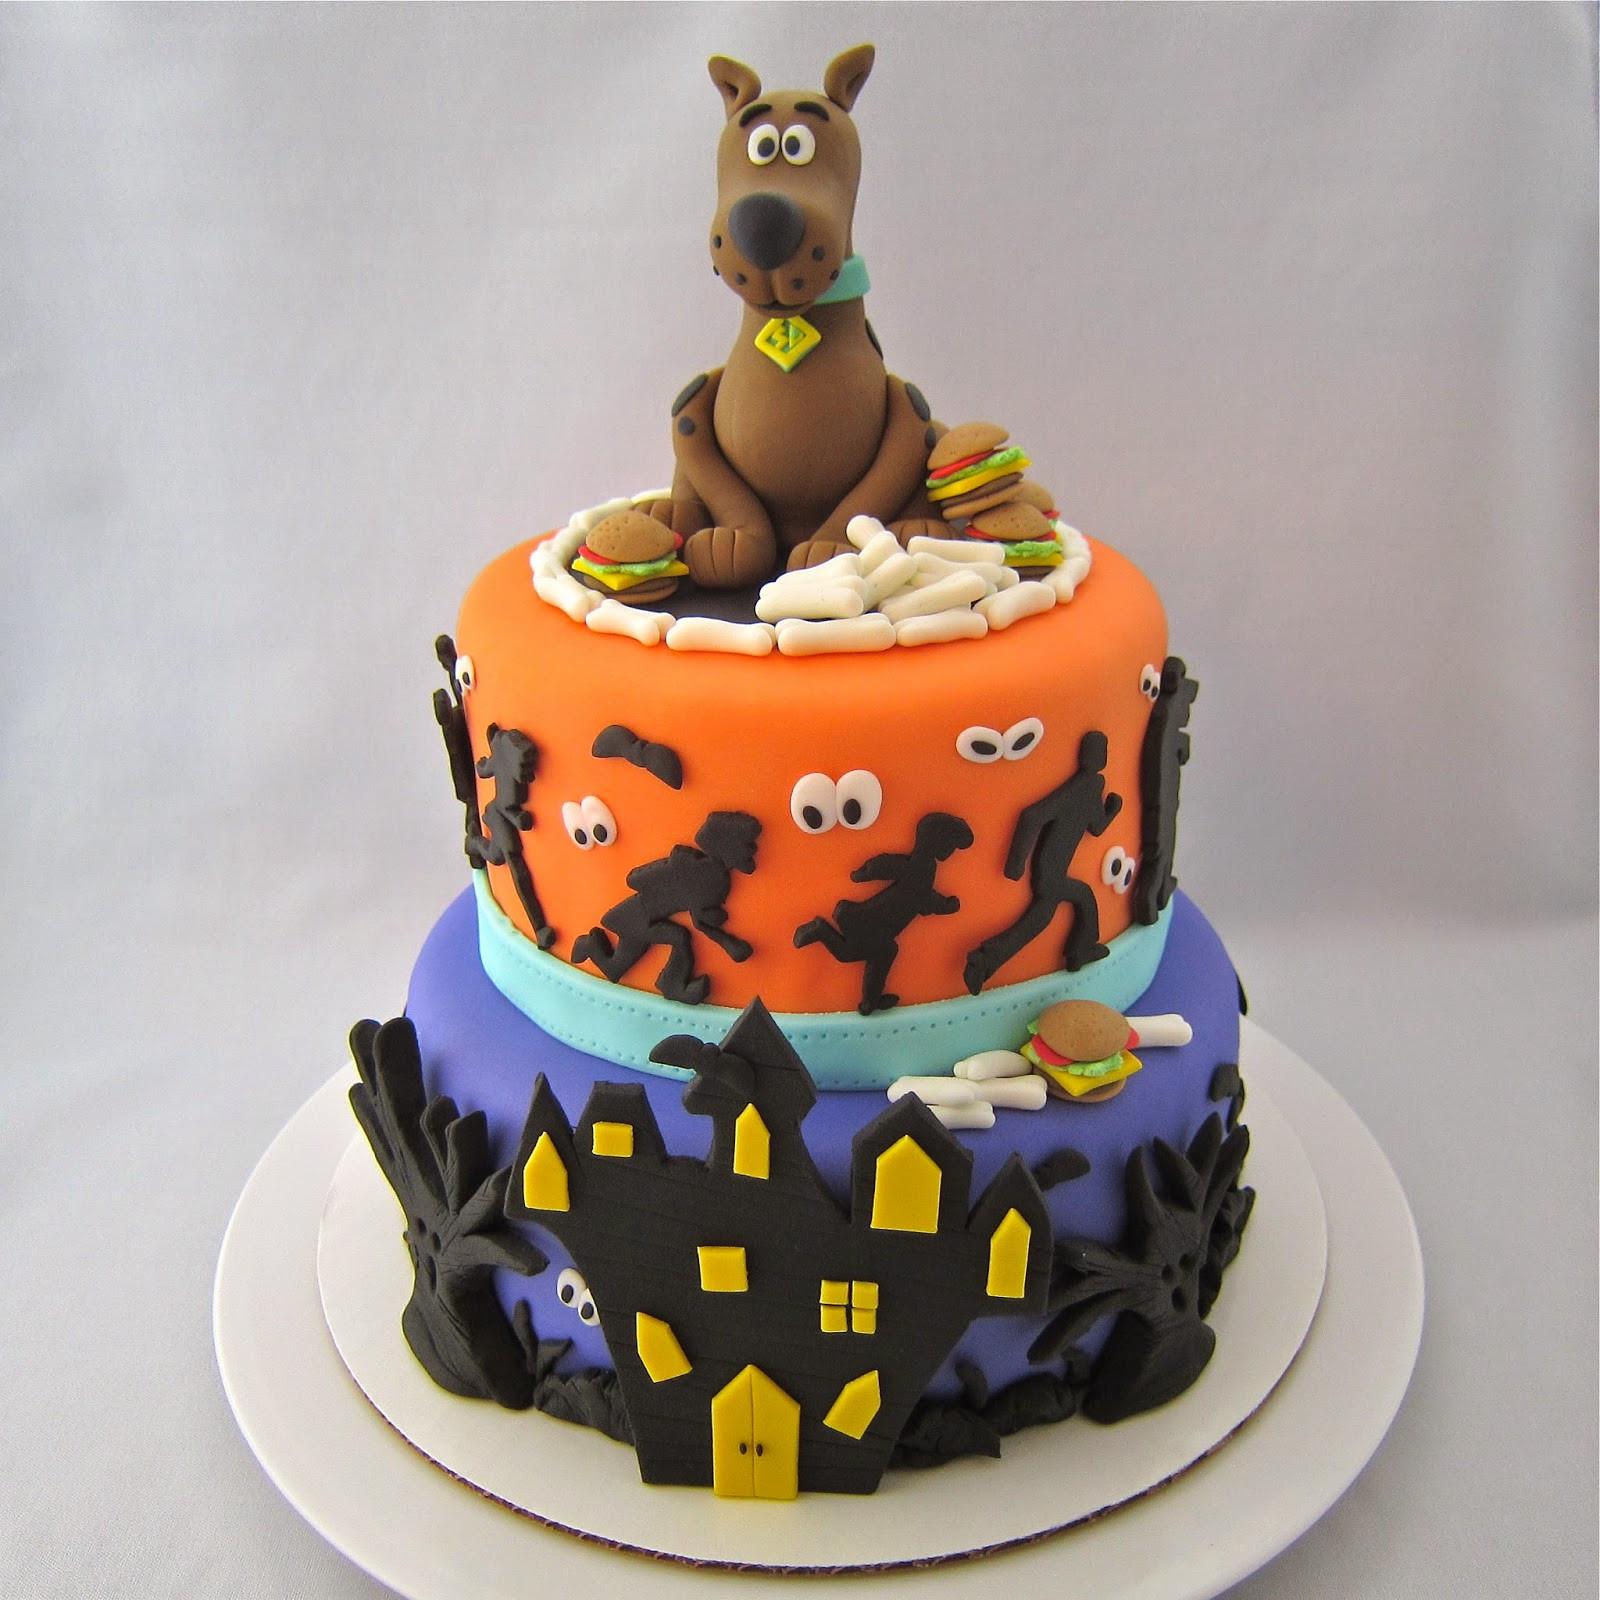 Scooby Doo Birthday Cakes  Clever Wren Scooby Doo Cake Cake of Cakes